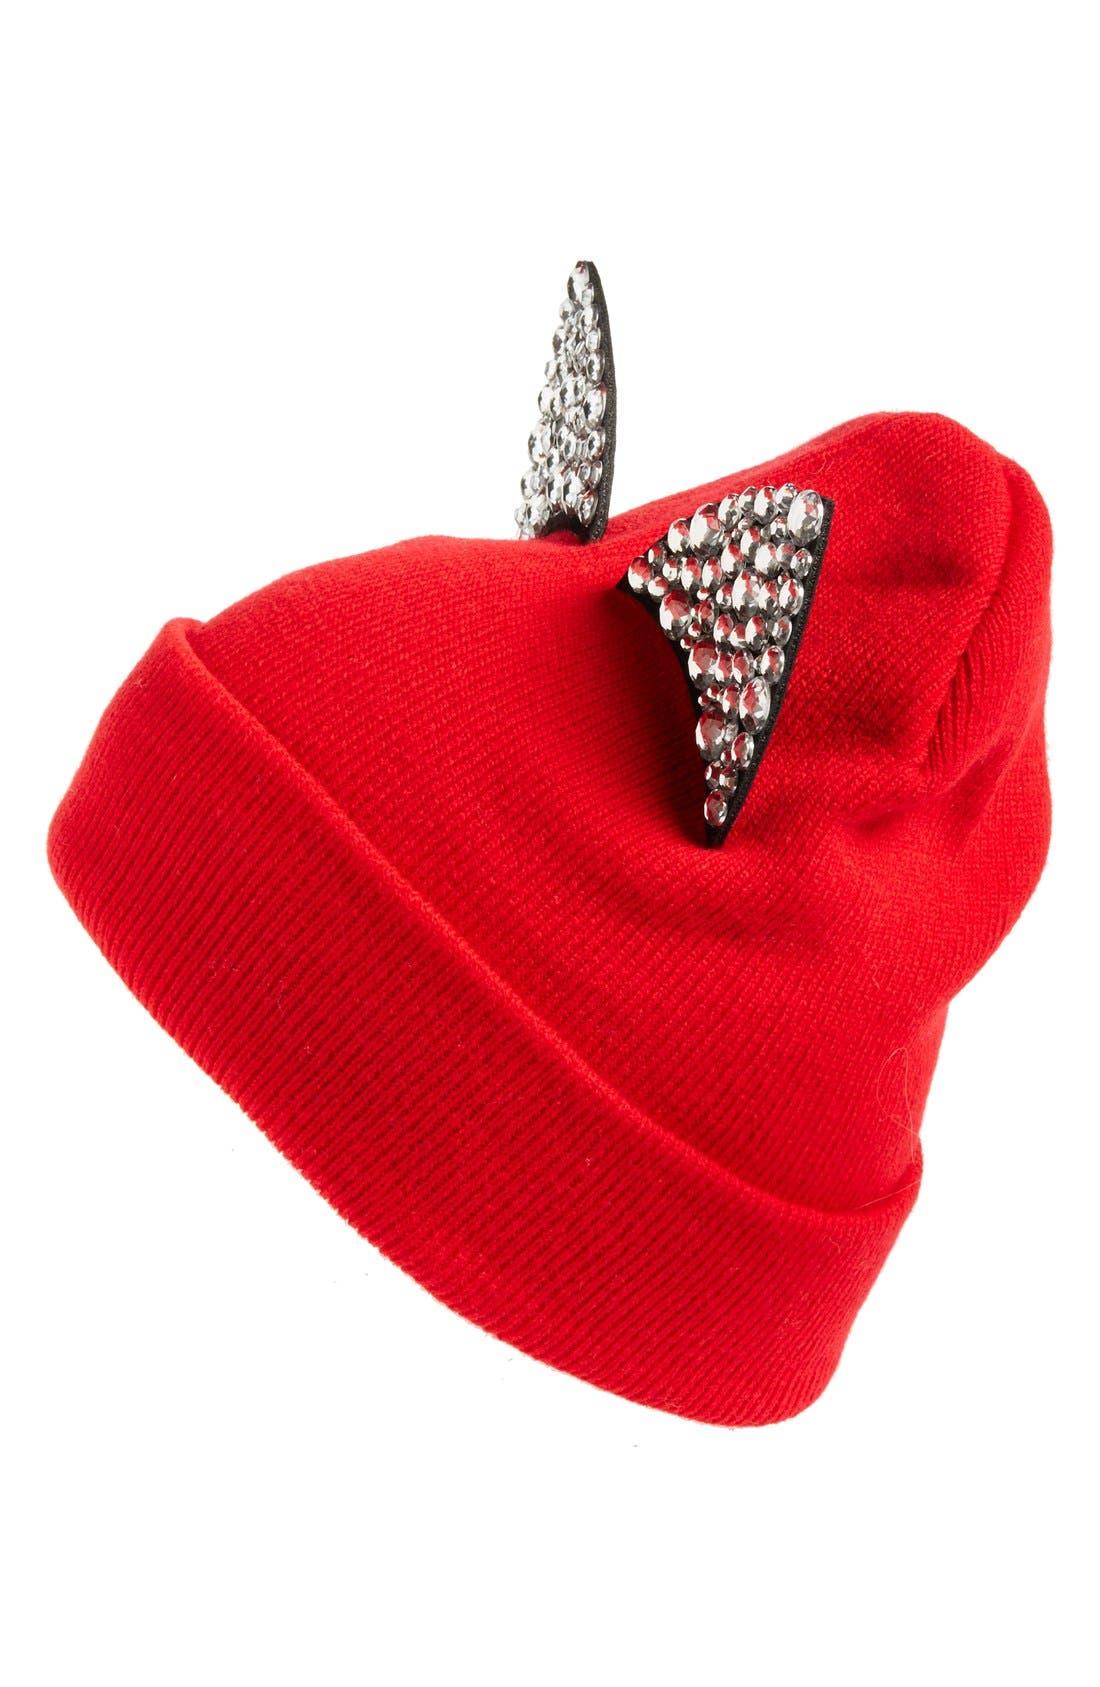 Jeweled Cat Ear Beanie,                             Main thumbnail 3, color,